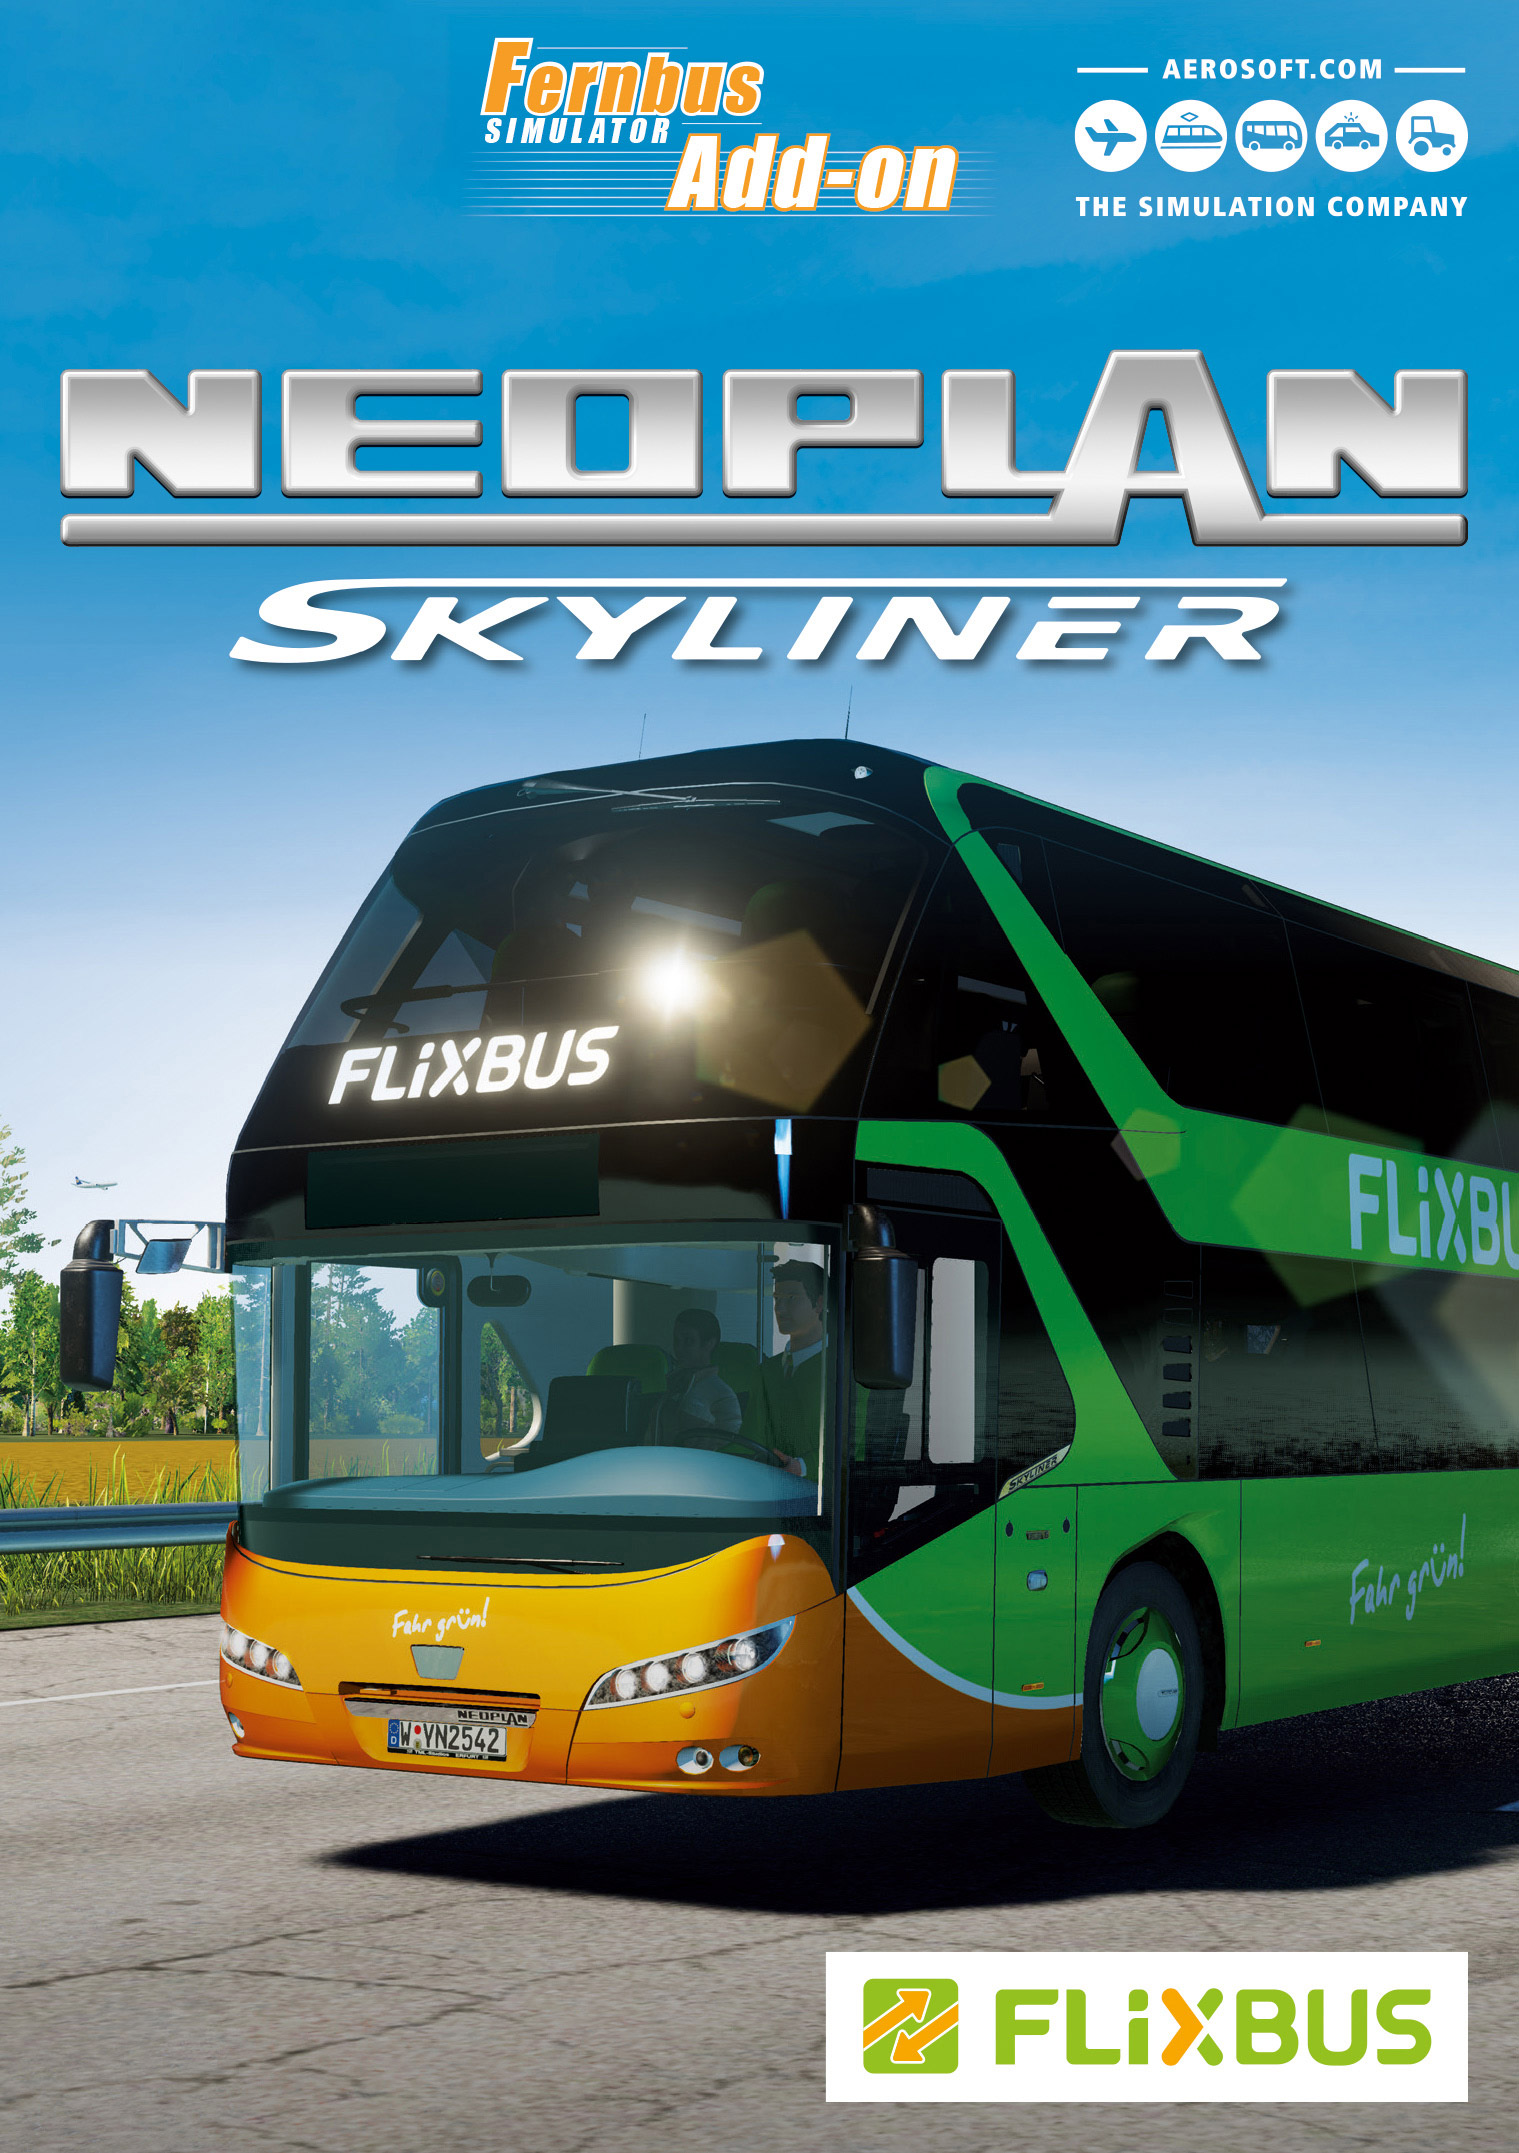 fernbus-simulator-add-on-neoplan-skyliner-pc-code-steam